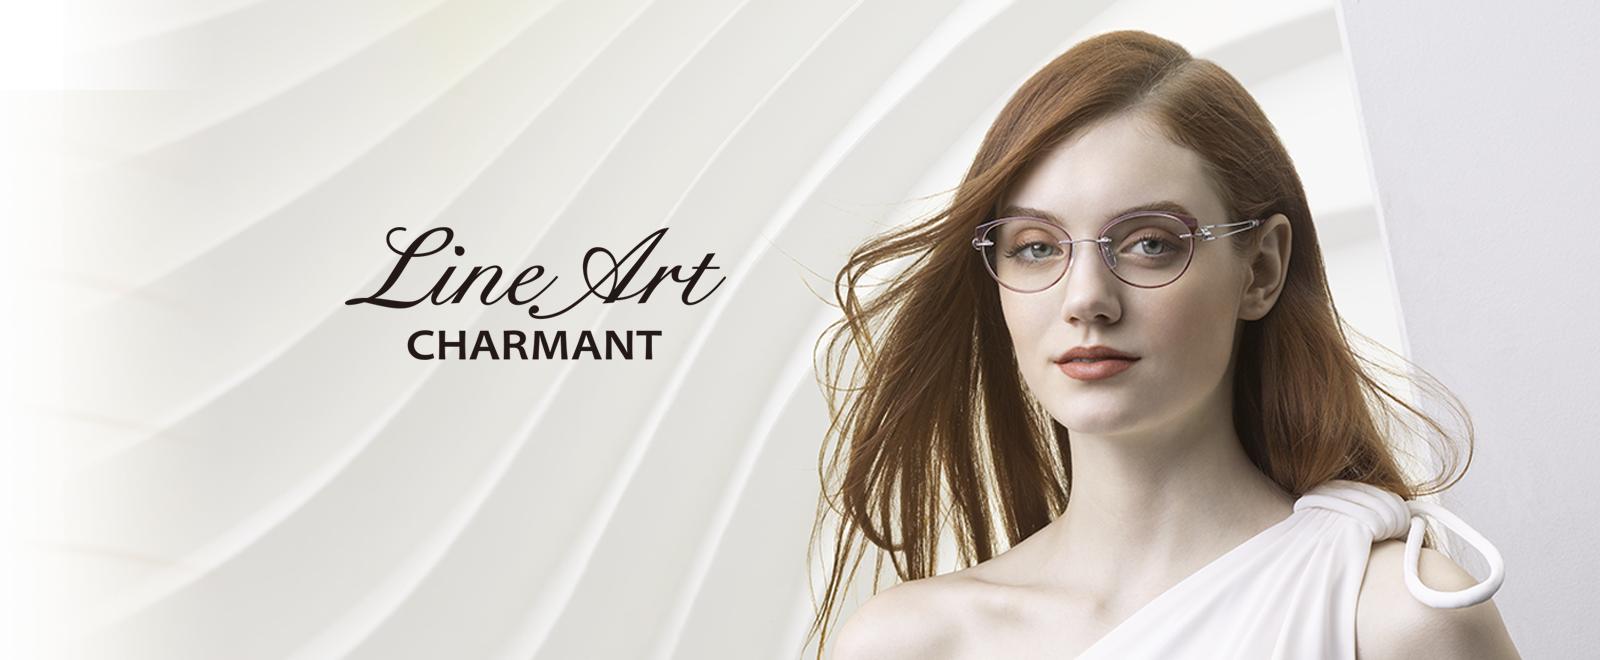 Line Art Xl 2000 : 【charmant·line】line art charmant toupeenseen部落格